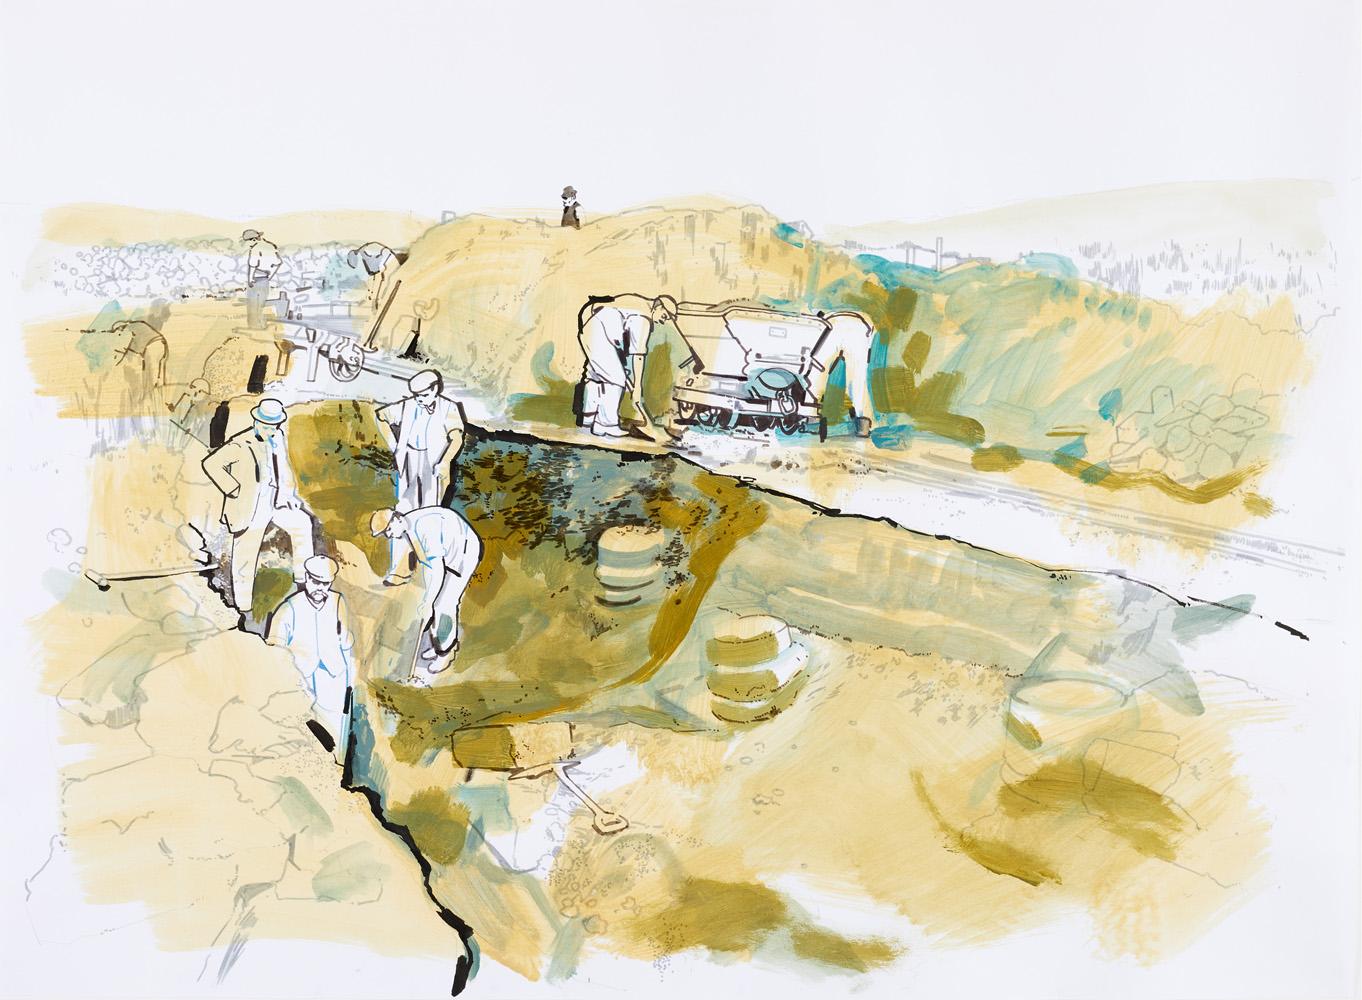 Corbridge-Edwardian dig illustration-1000.jpg